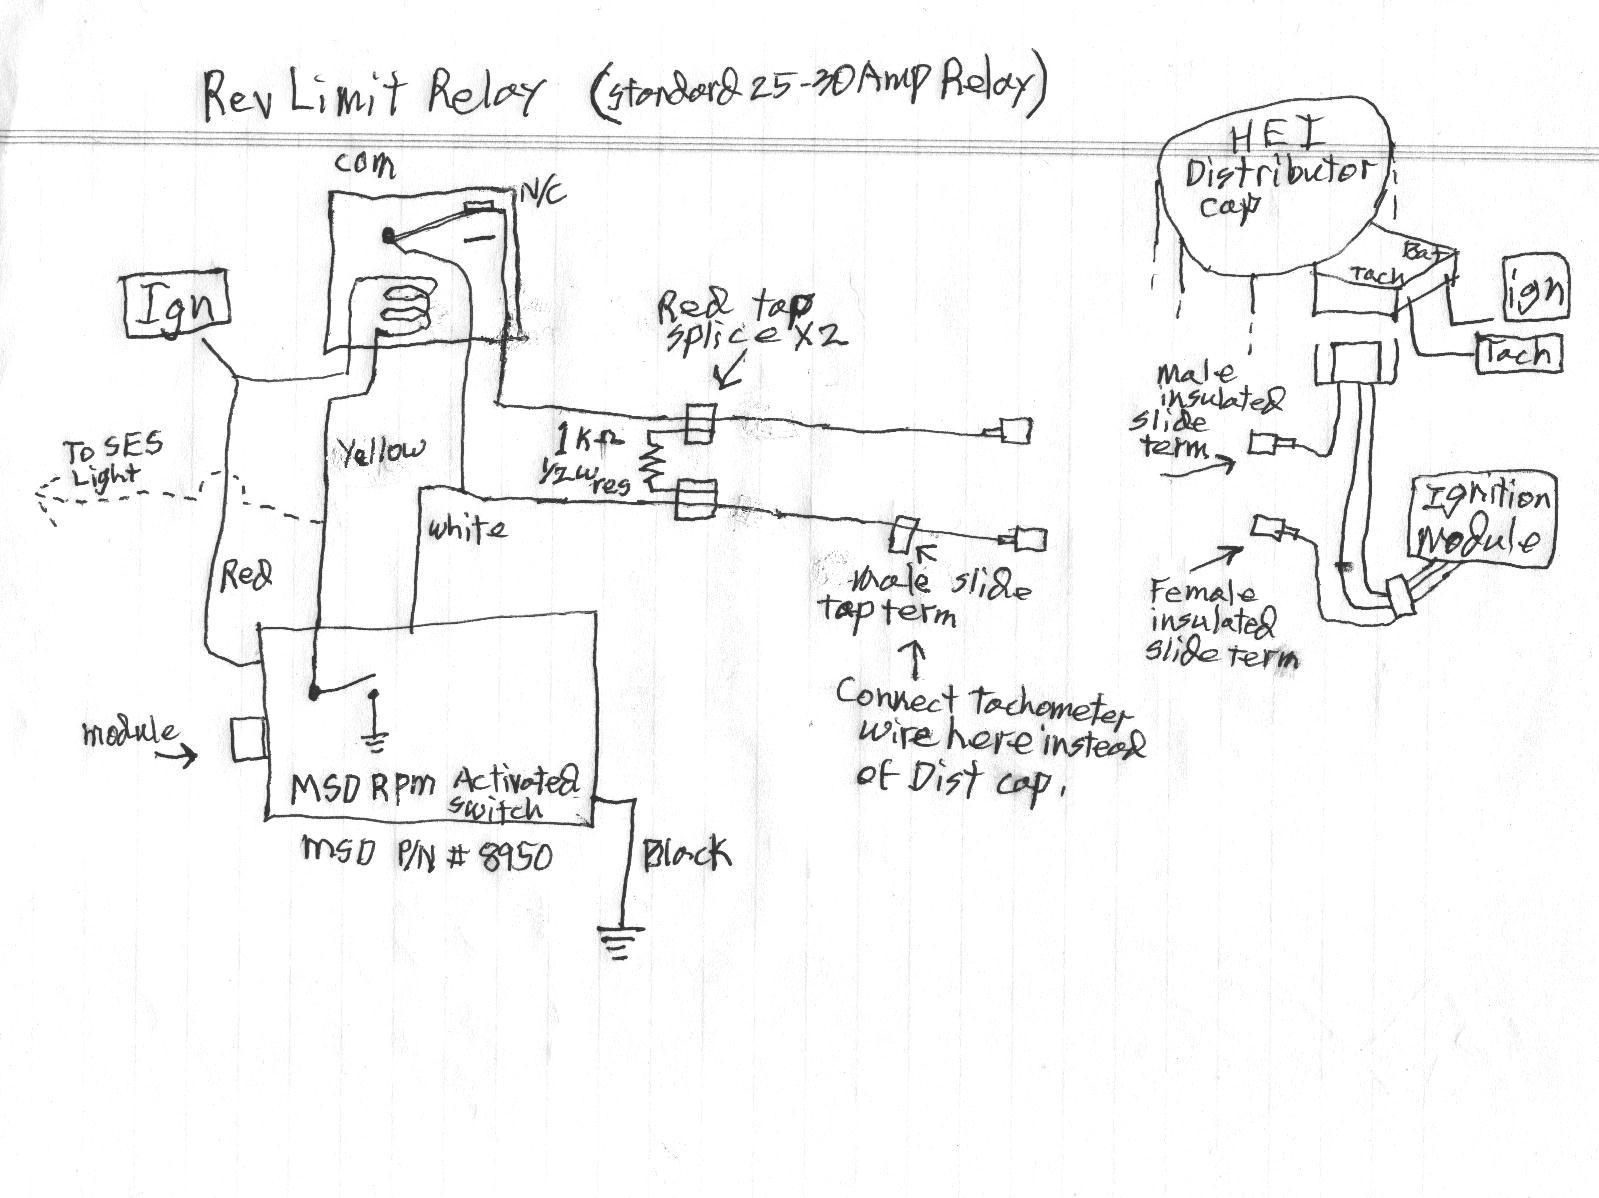 [ZSVE_7041]  MK_4947] Pro Comp Tach Wiring Diagram Hei Free Image About Wiring Diagram  And Download Diagram | Chevy Tach Wiring |  | Hyedi Stre Sieg Hendil Mohammedshrine Librar Wiring 101